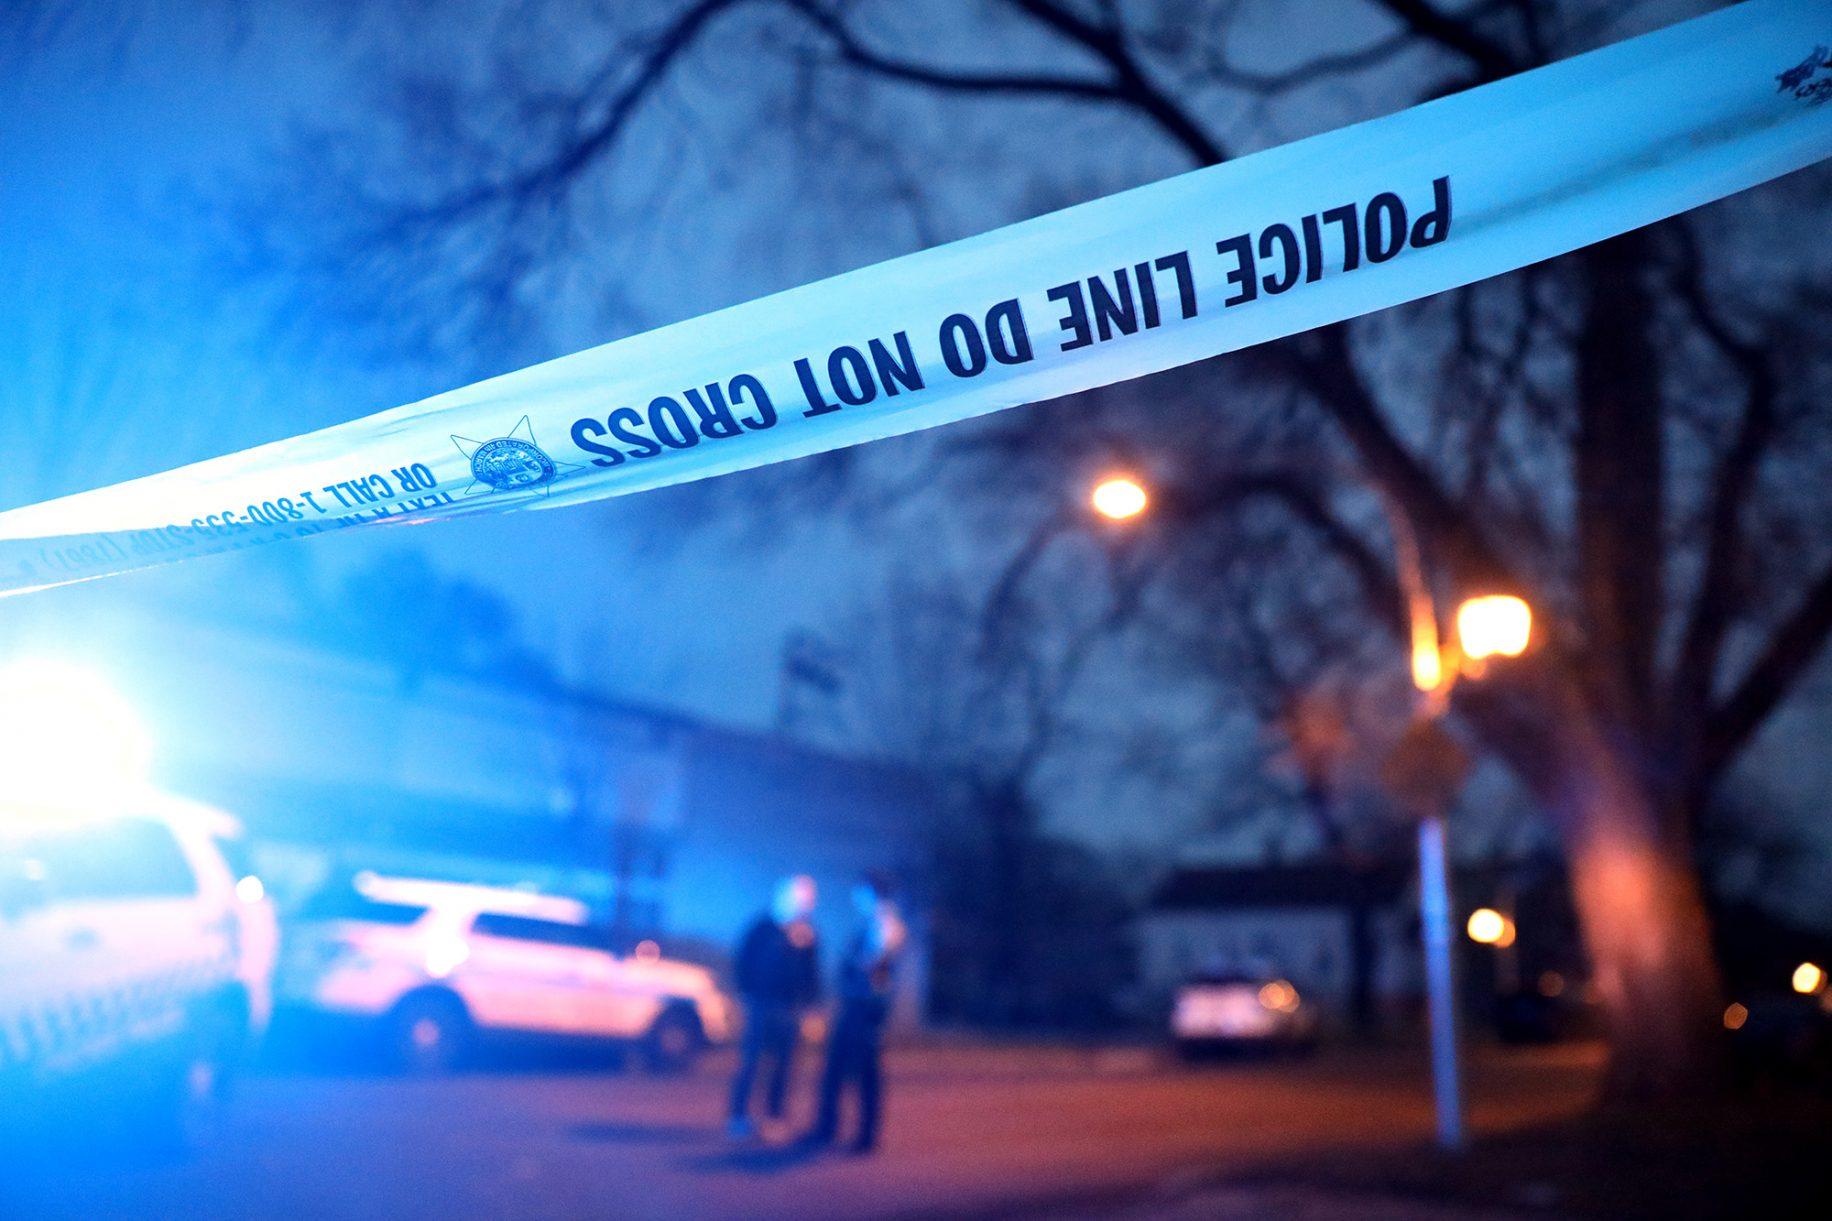 MS-13 gang's bloody reign of terror in San Fernando Valley leaves residents horrified